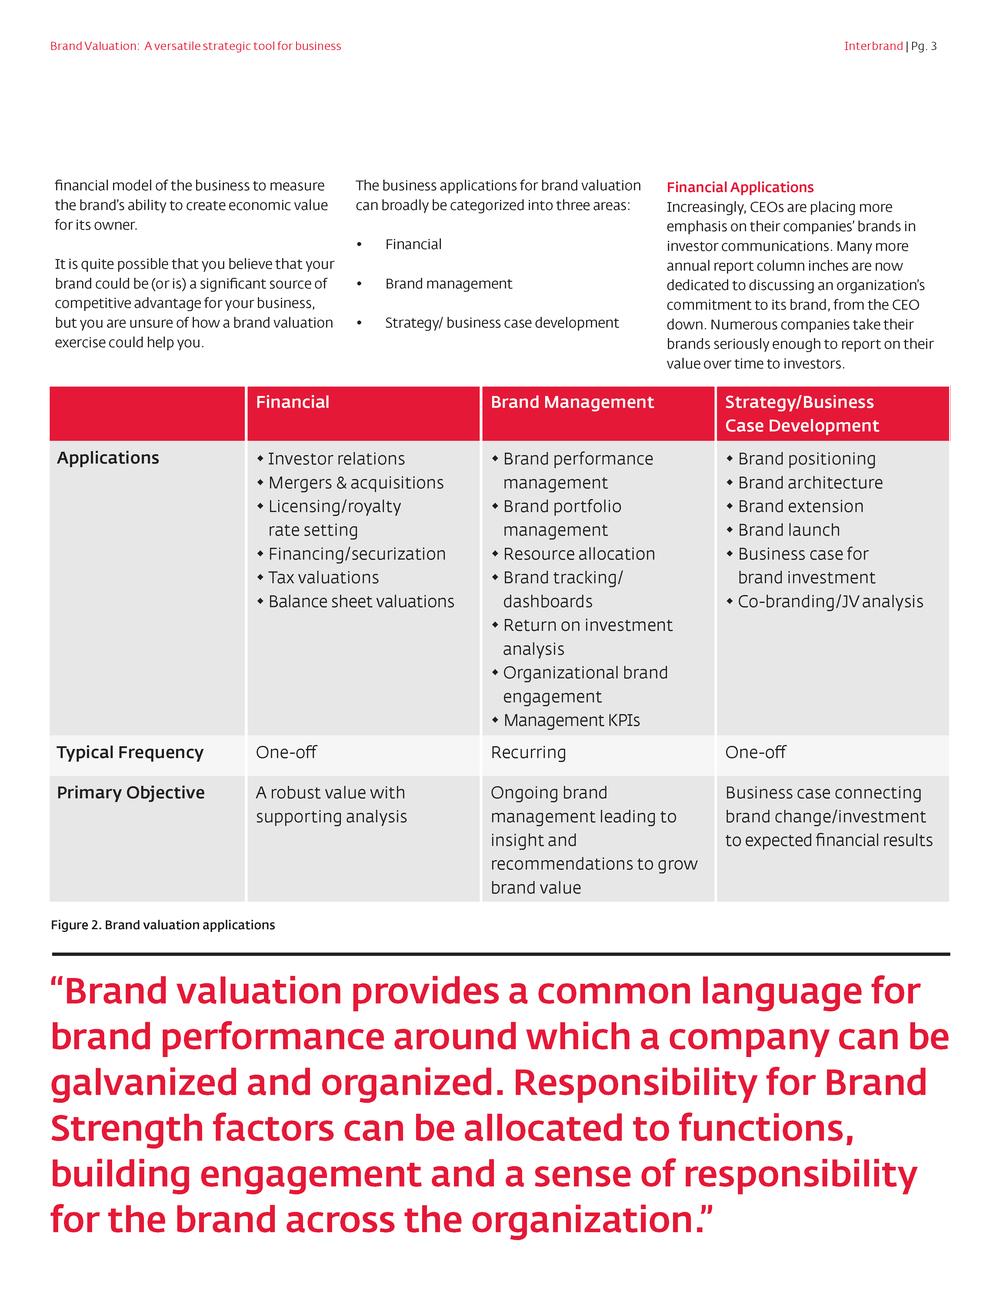 brandvaluation-3.jpg